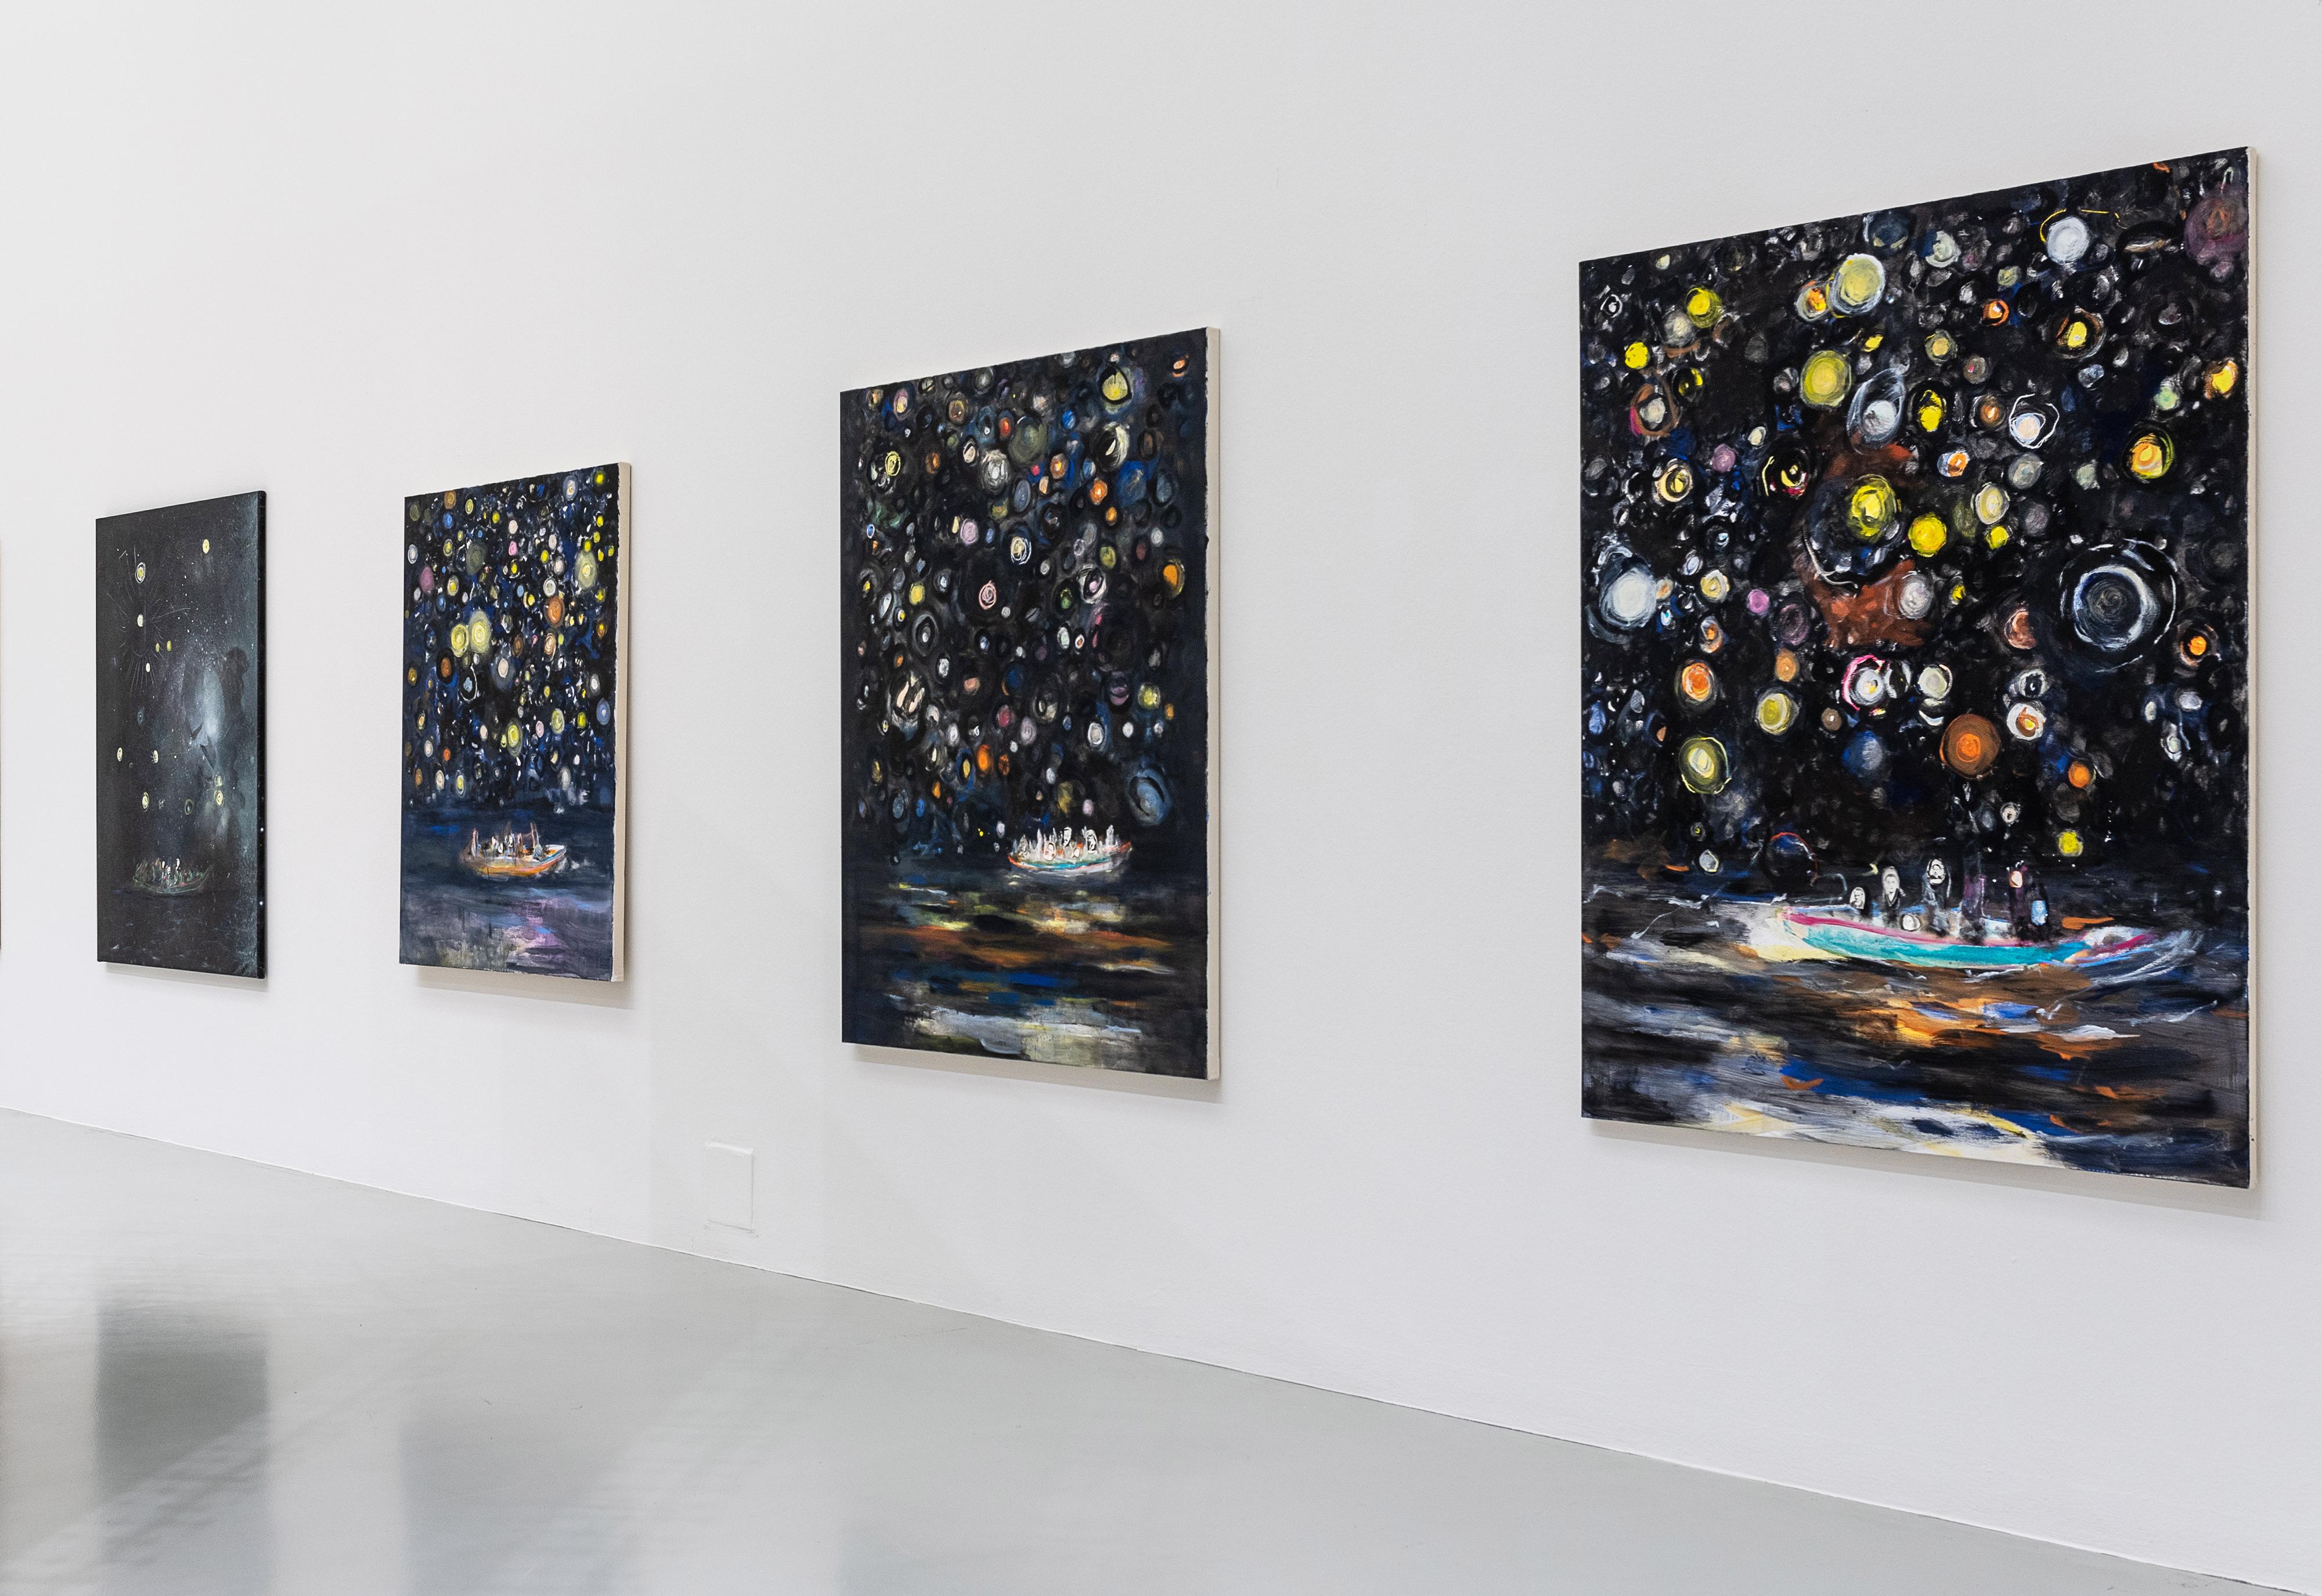 Galerie Barbara Thumm \ Valérie Favre – HOW TO SURVIVE – Kunst als Überlebensstrategie